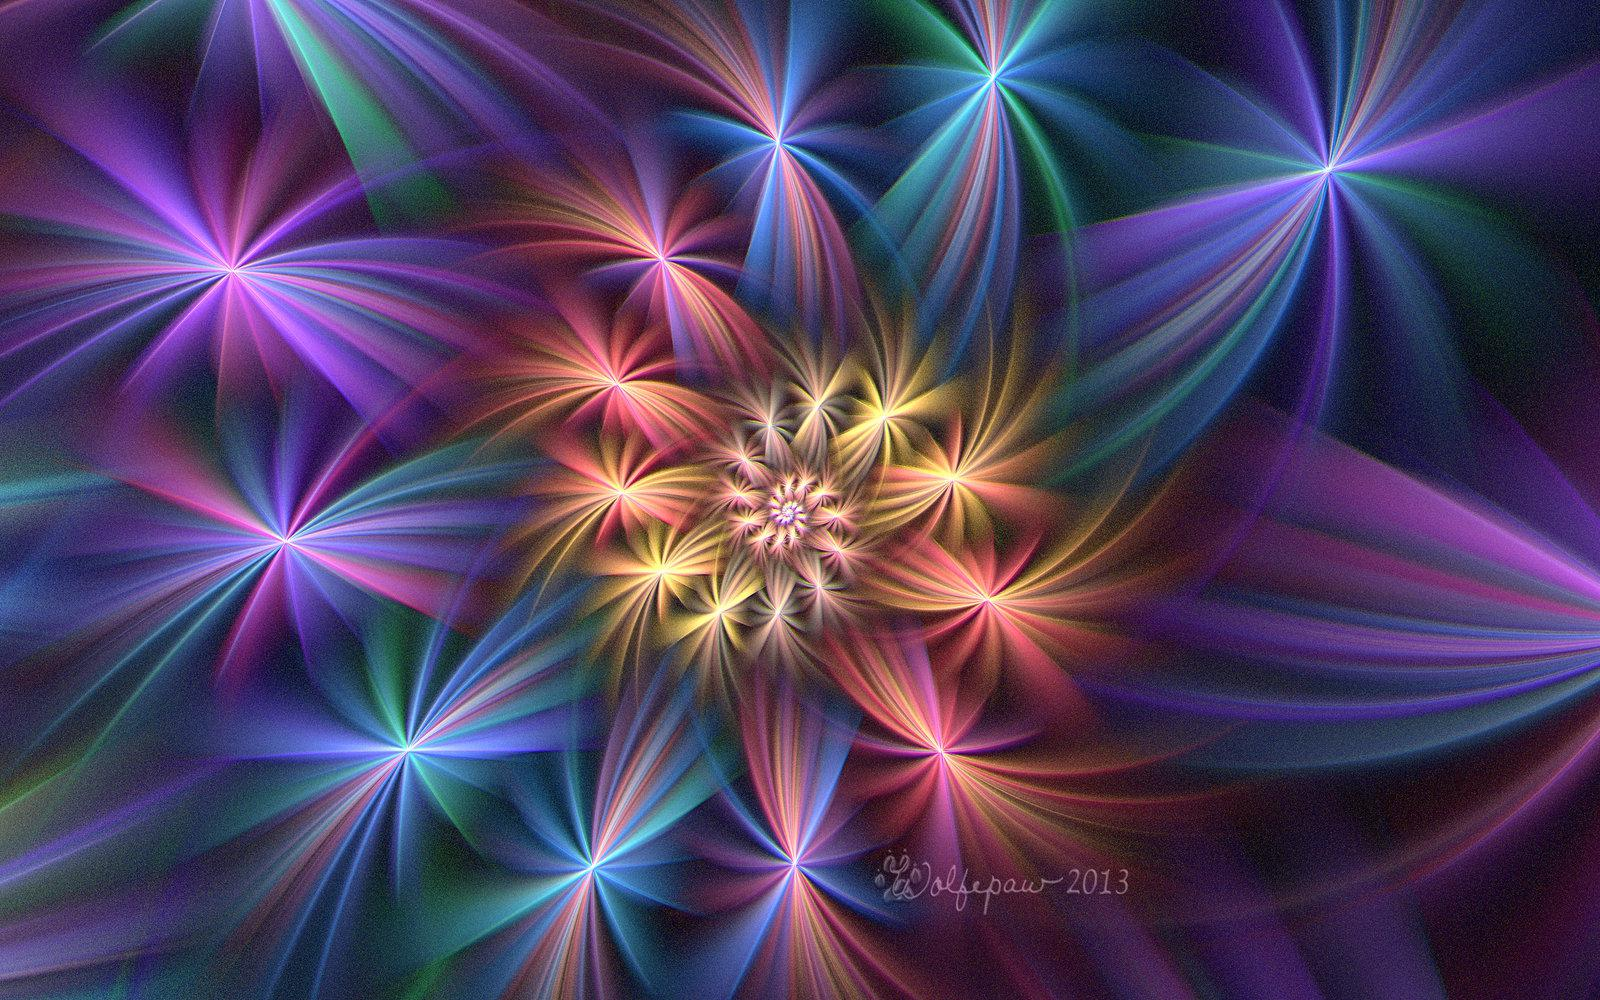 STARS ROTATING SPIRAL WALLPAPER   146250   HD Wallpapers 1600x1000